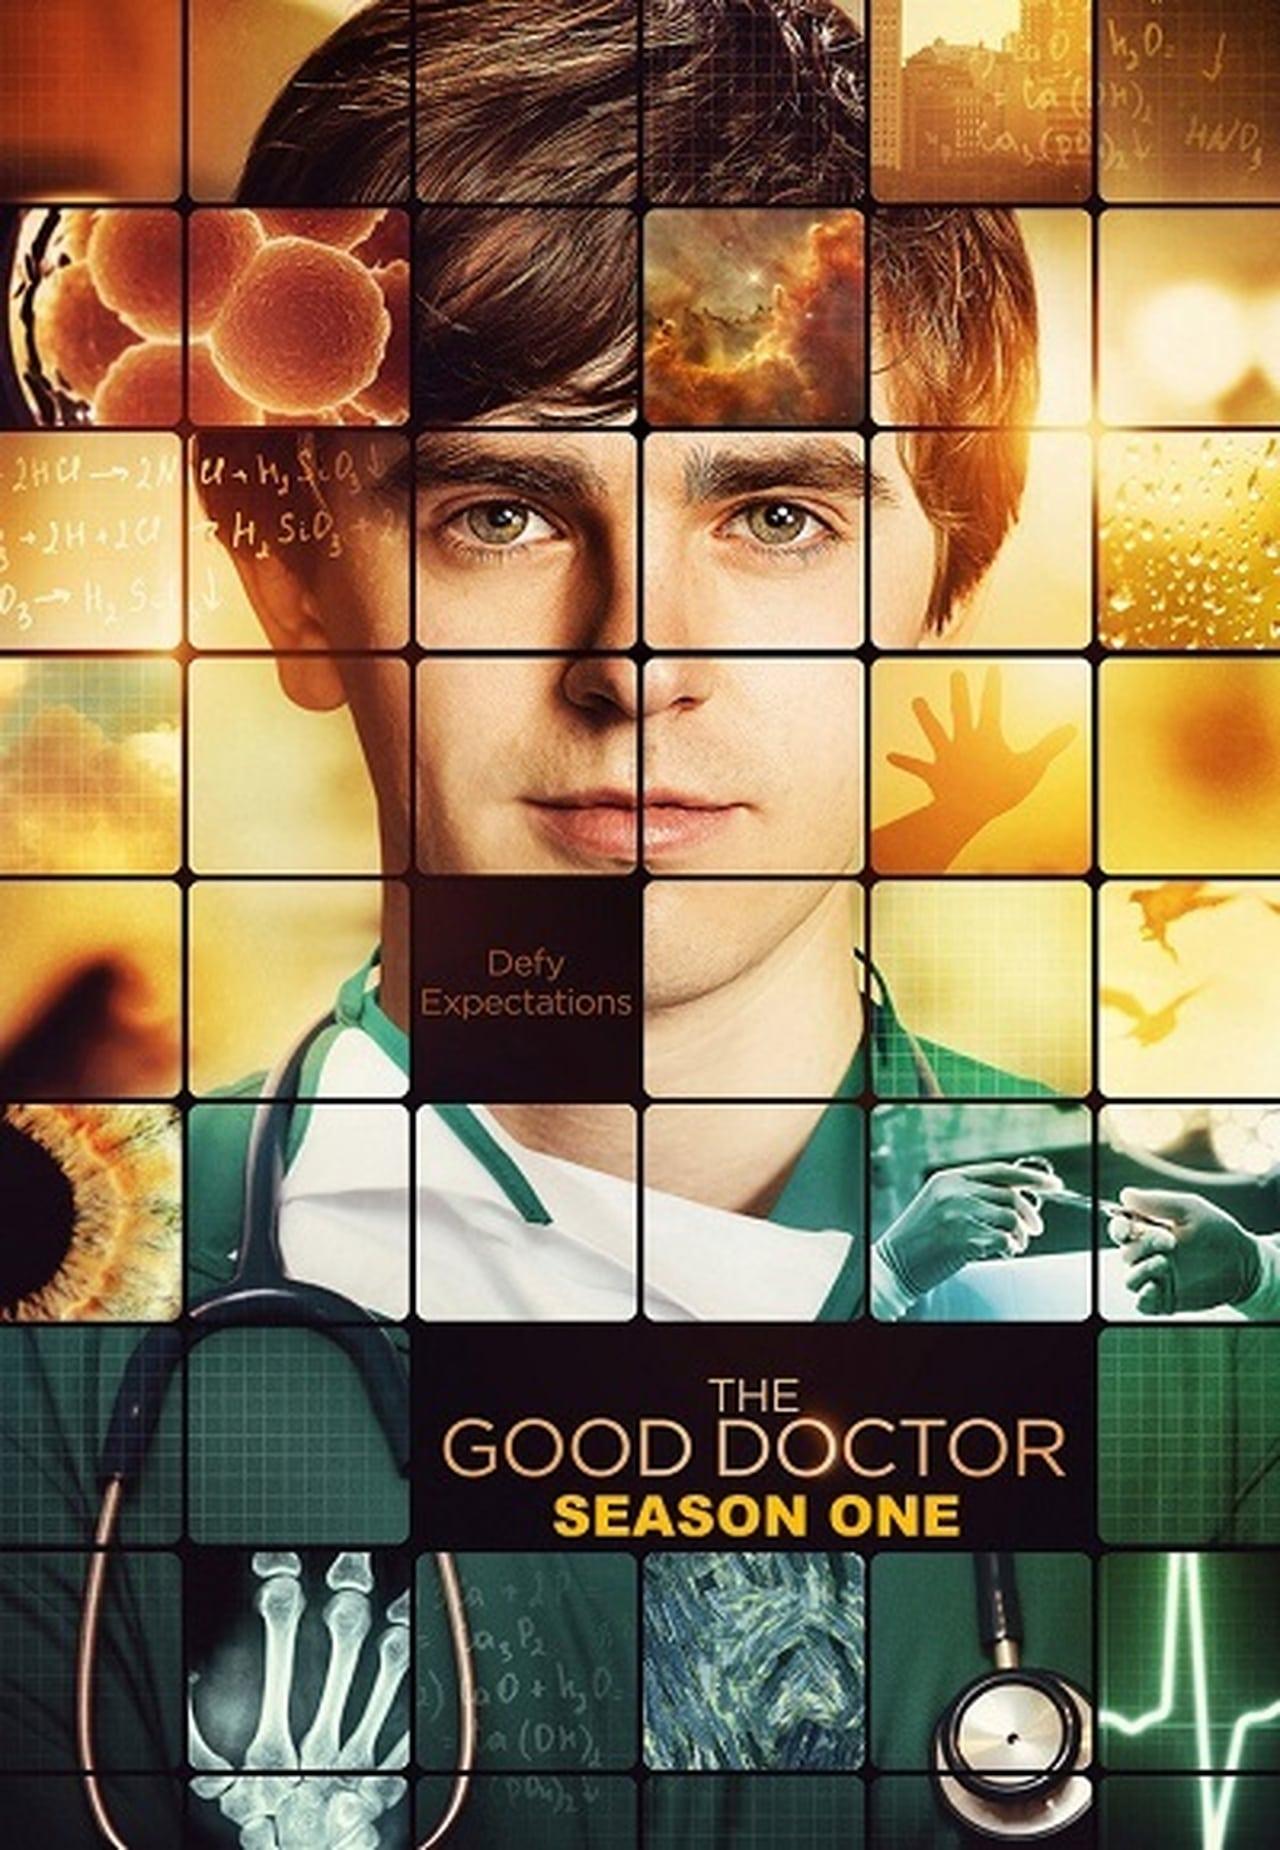 The Good Doctor Season 1 (2017) putlockers cafe